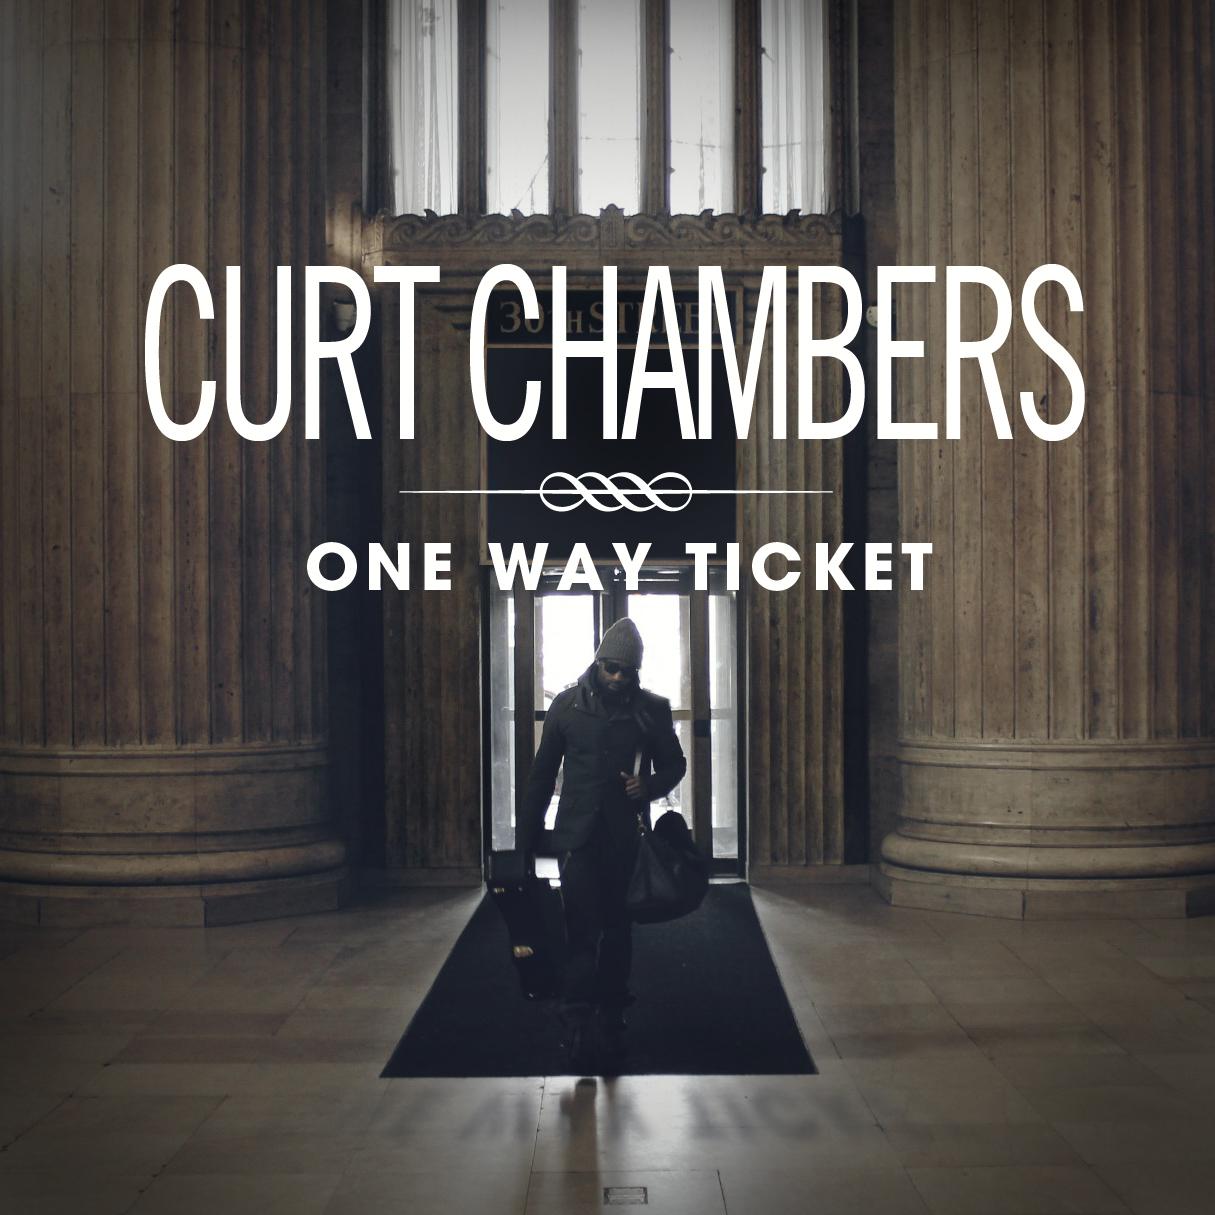 Curt Chambers One Way Ticket